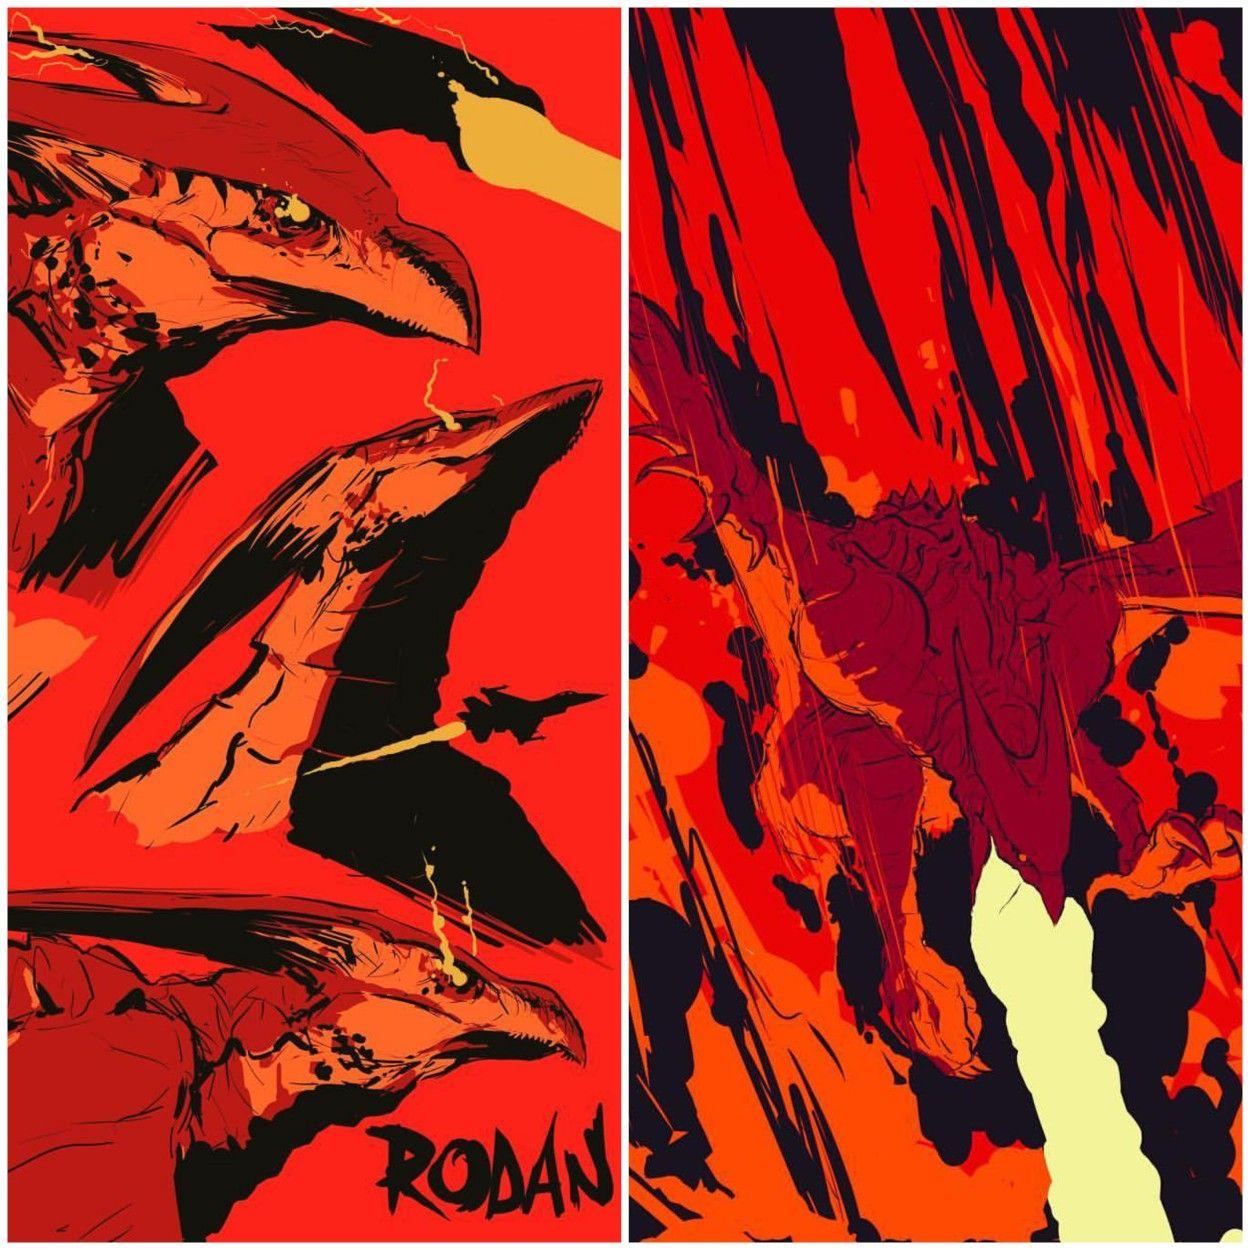 Godzilla 2 Imax Poster Textless: S181118 KOTM Aka Godzilla T